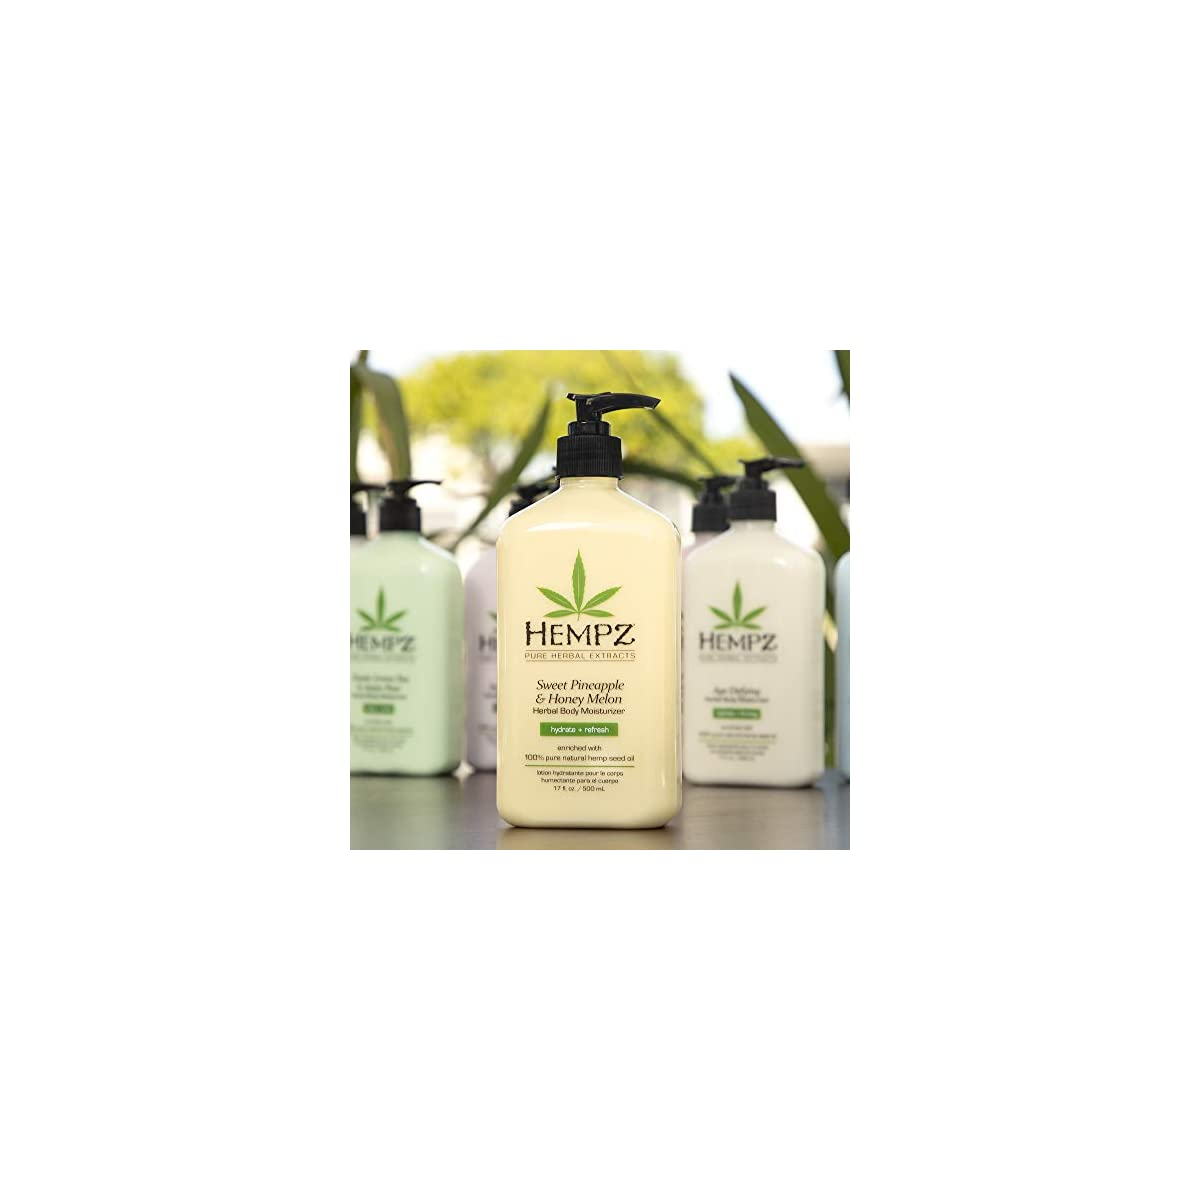 Hempz-Natural-Herbal-Body-Moisturizer-Sweet-Pineapple-Honey-Melon-Skin-Lotion-